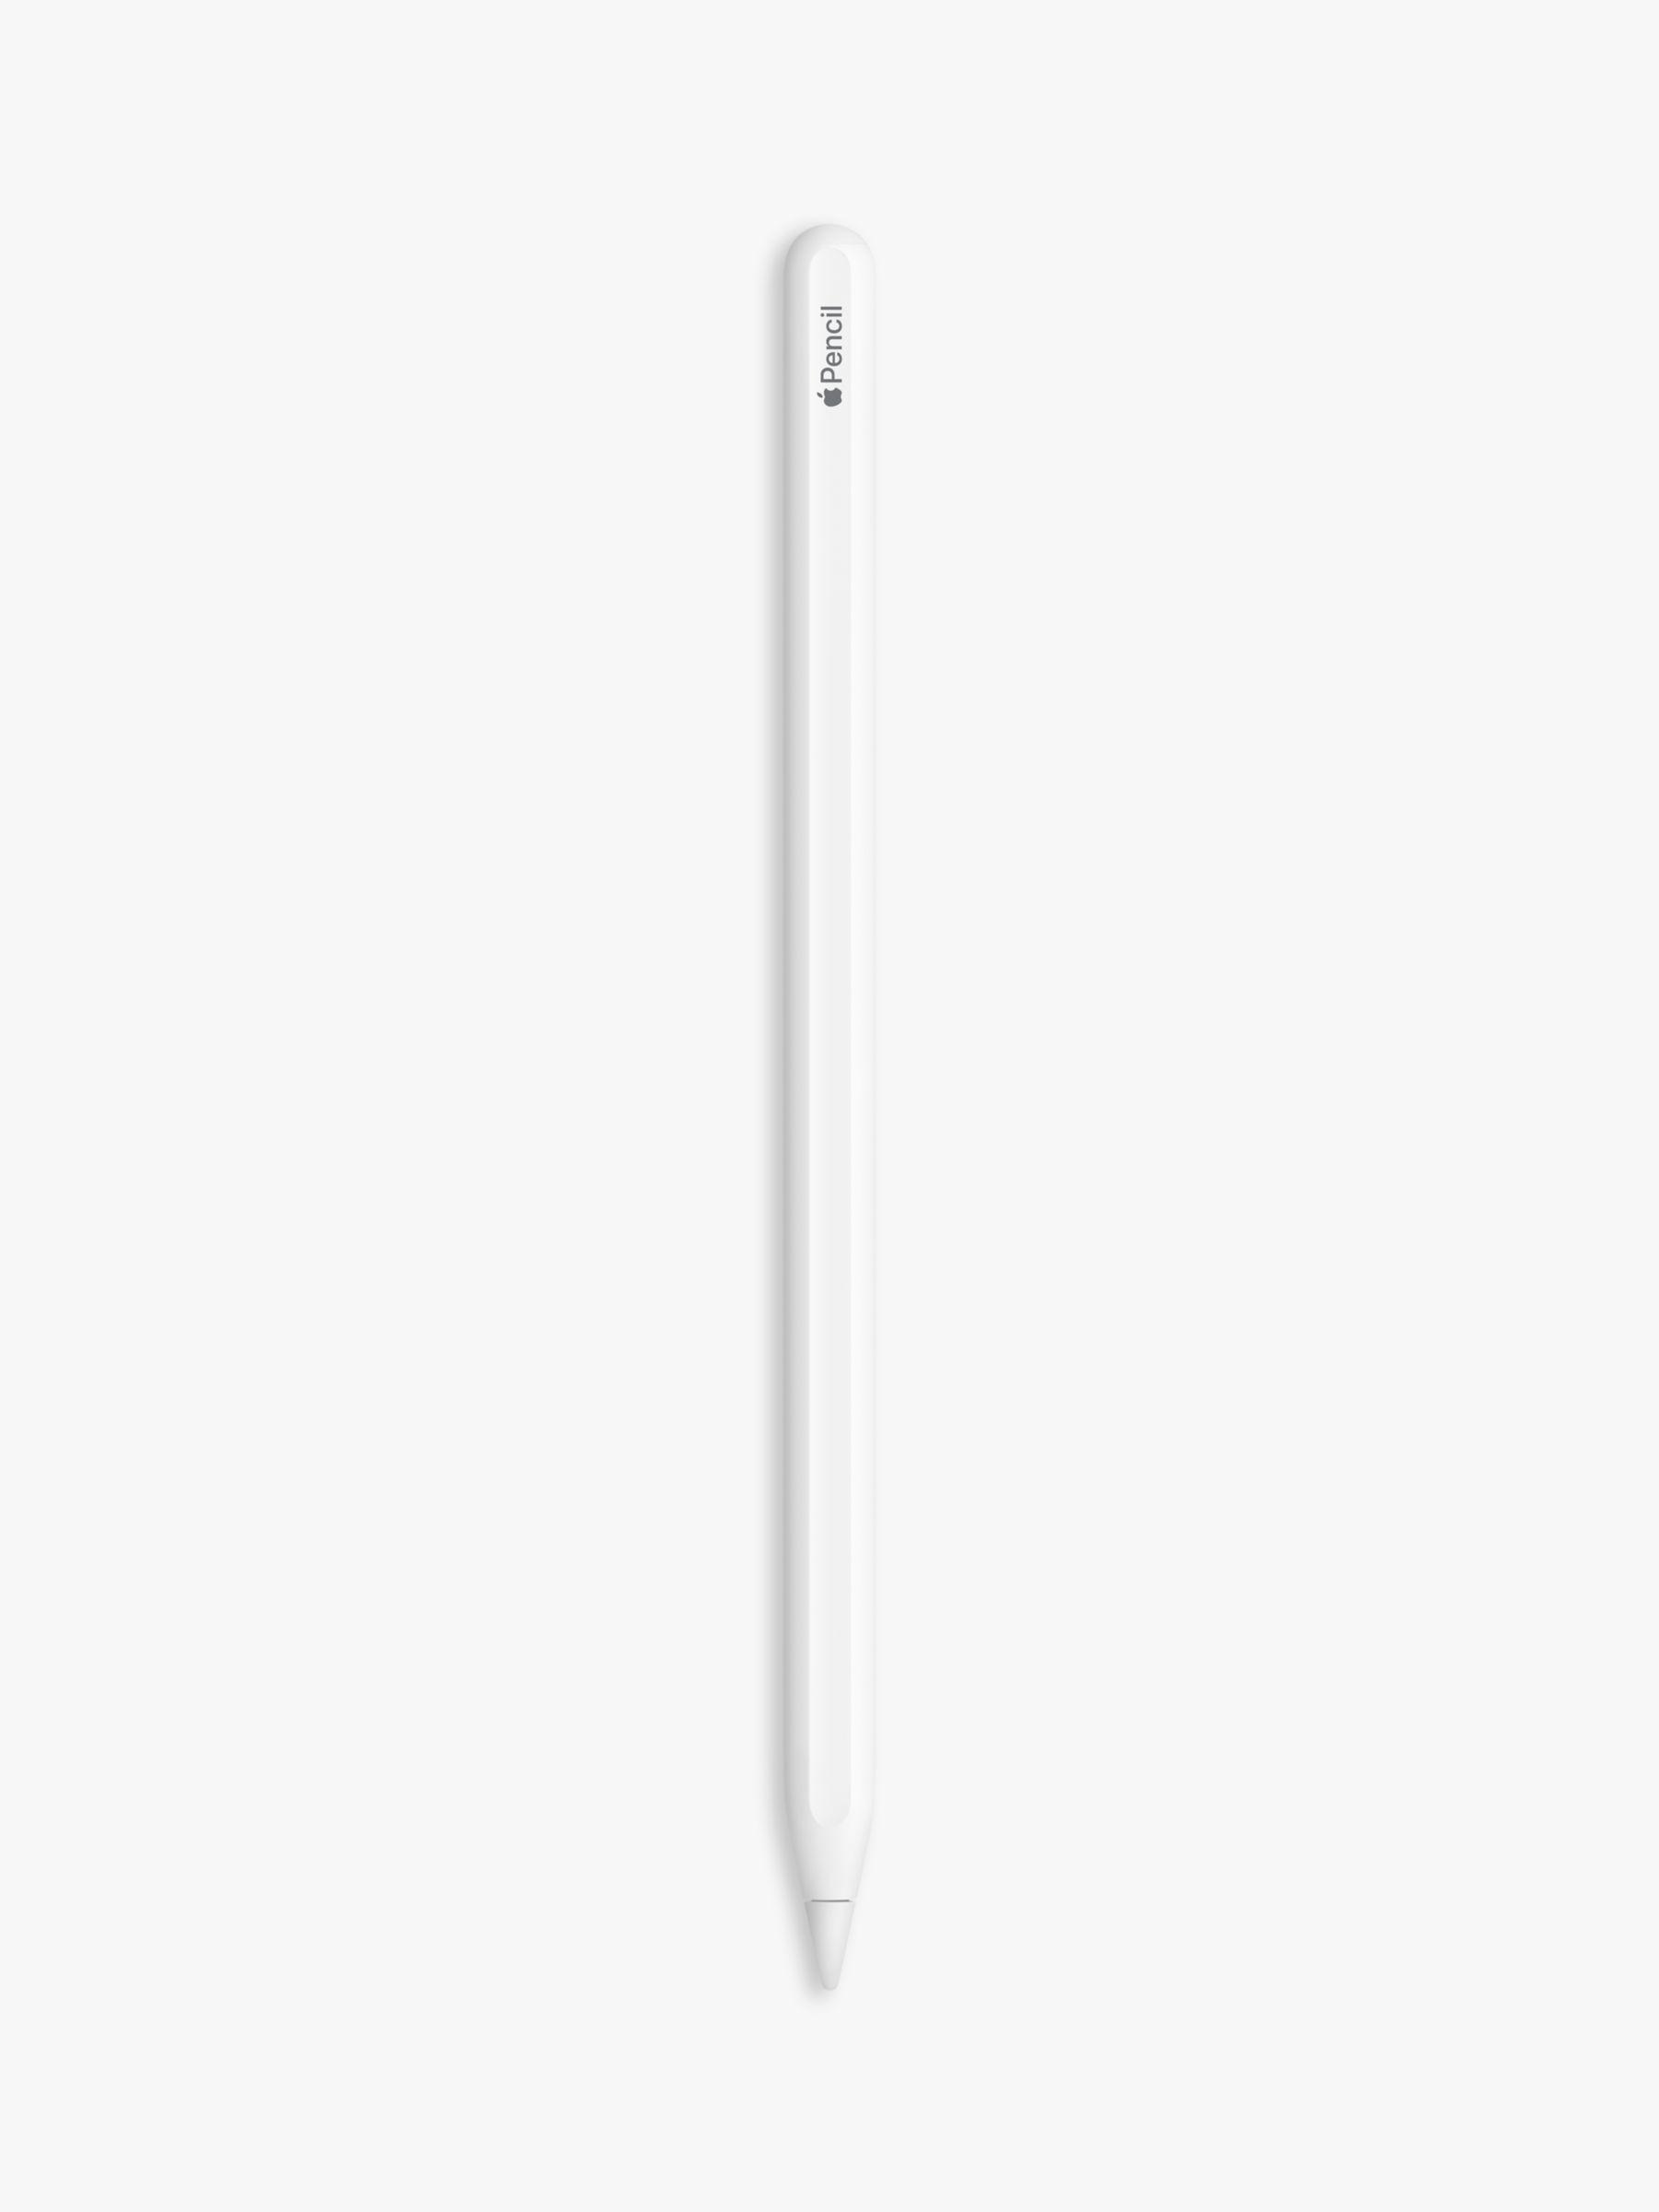 Apple Pencil 2nd Generation for iPad Pro (2018), Matt